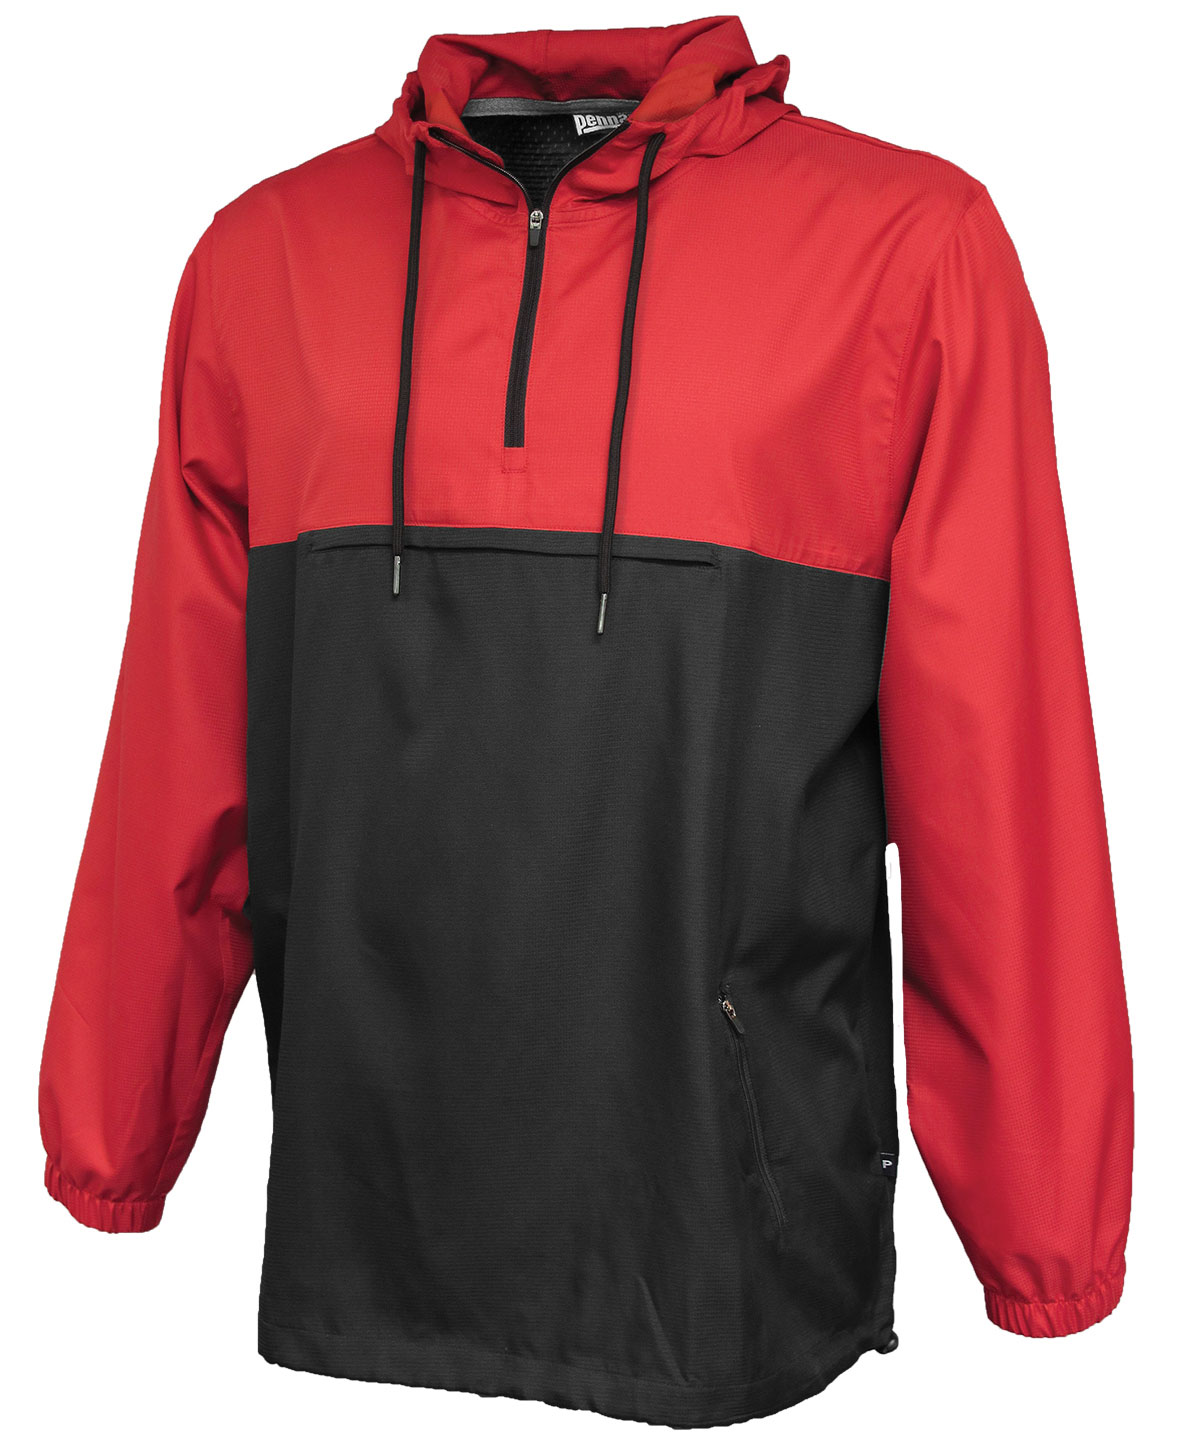 anorak jackets adult colorblock anorak jacket ZLMRDGU